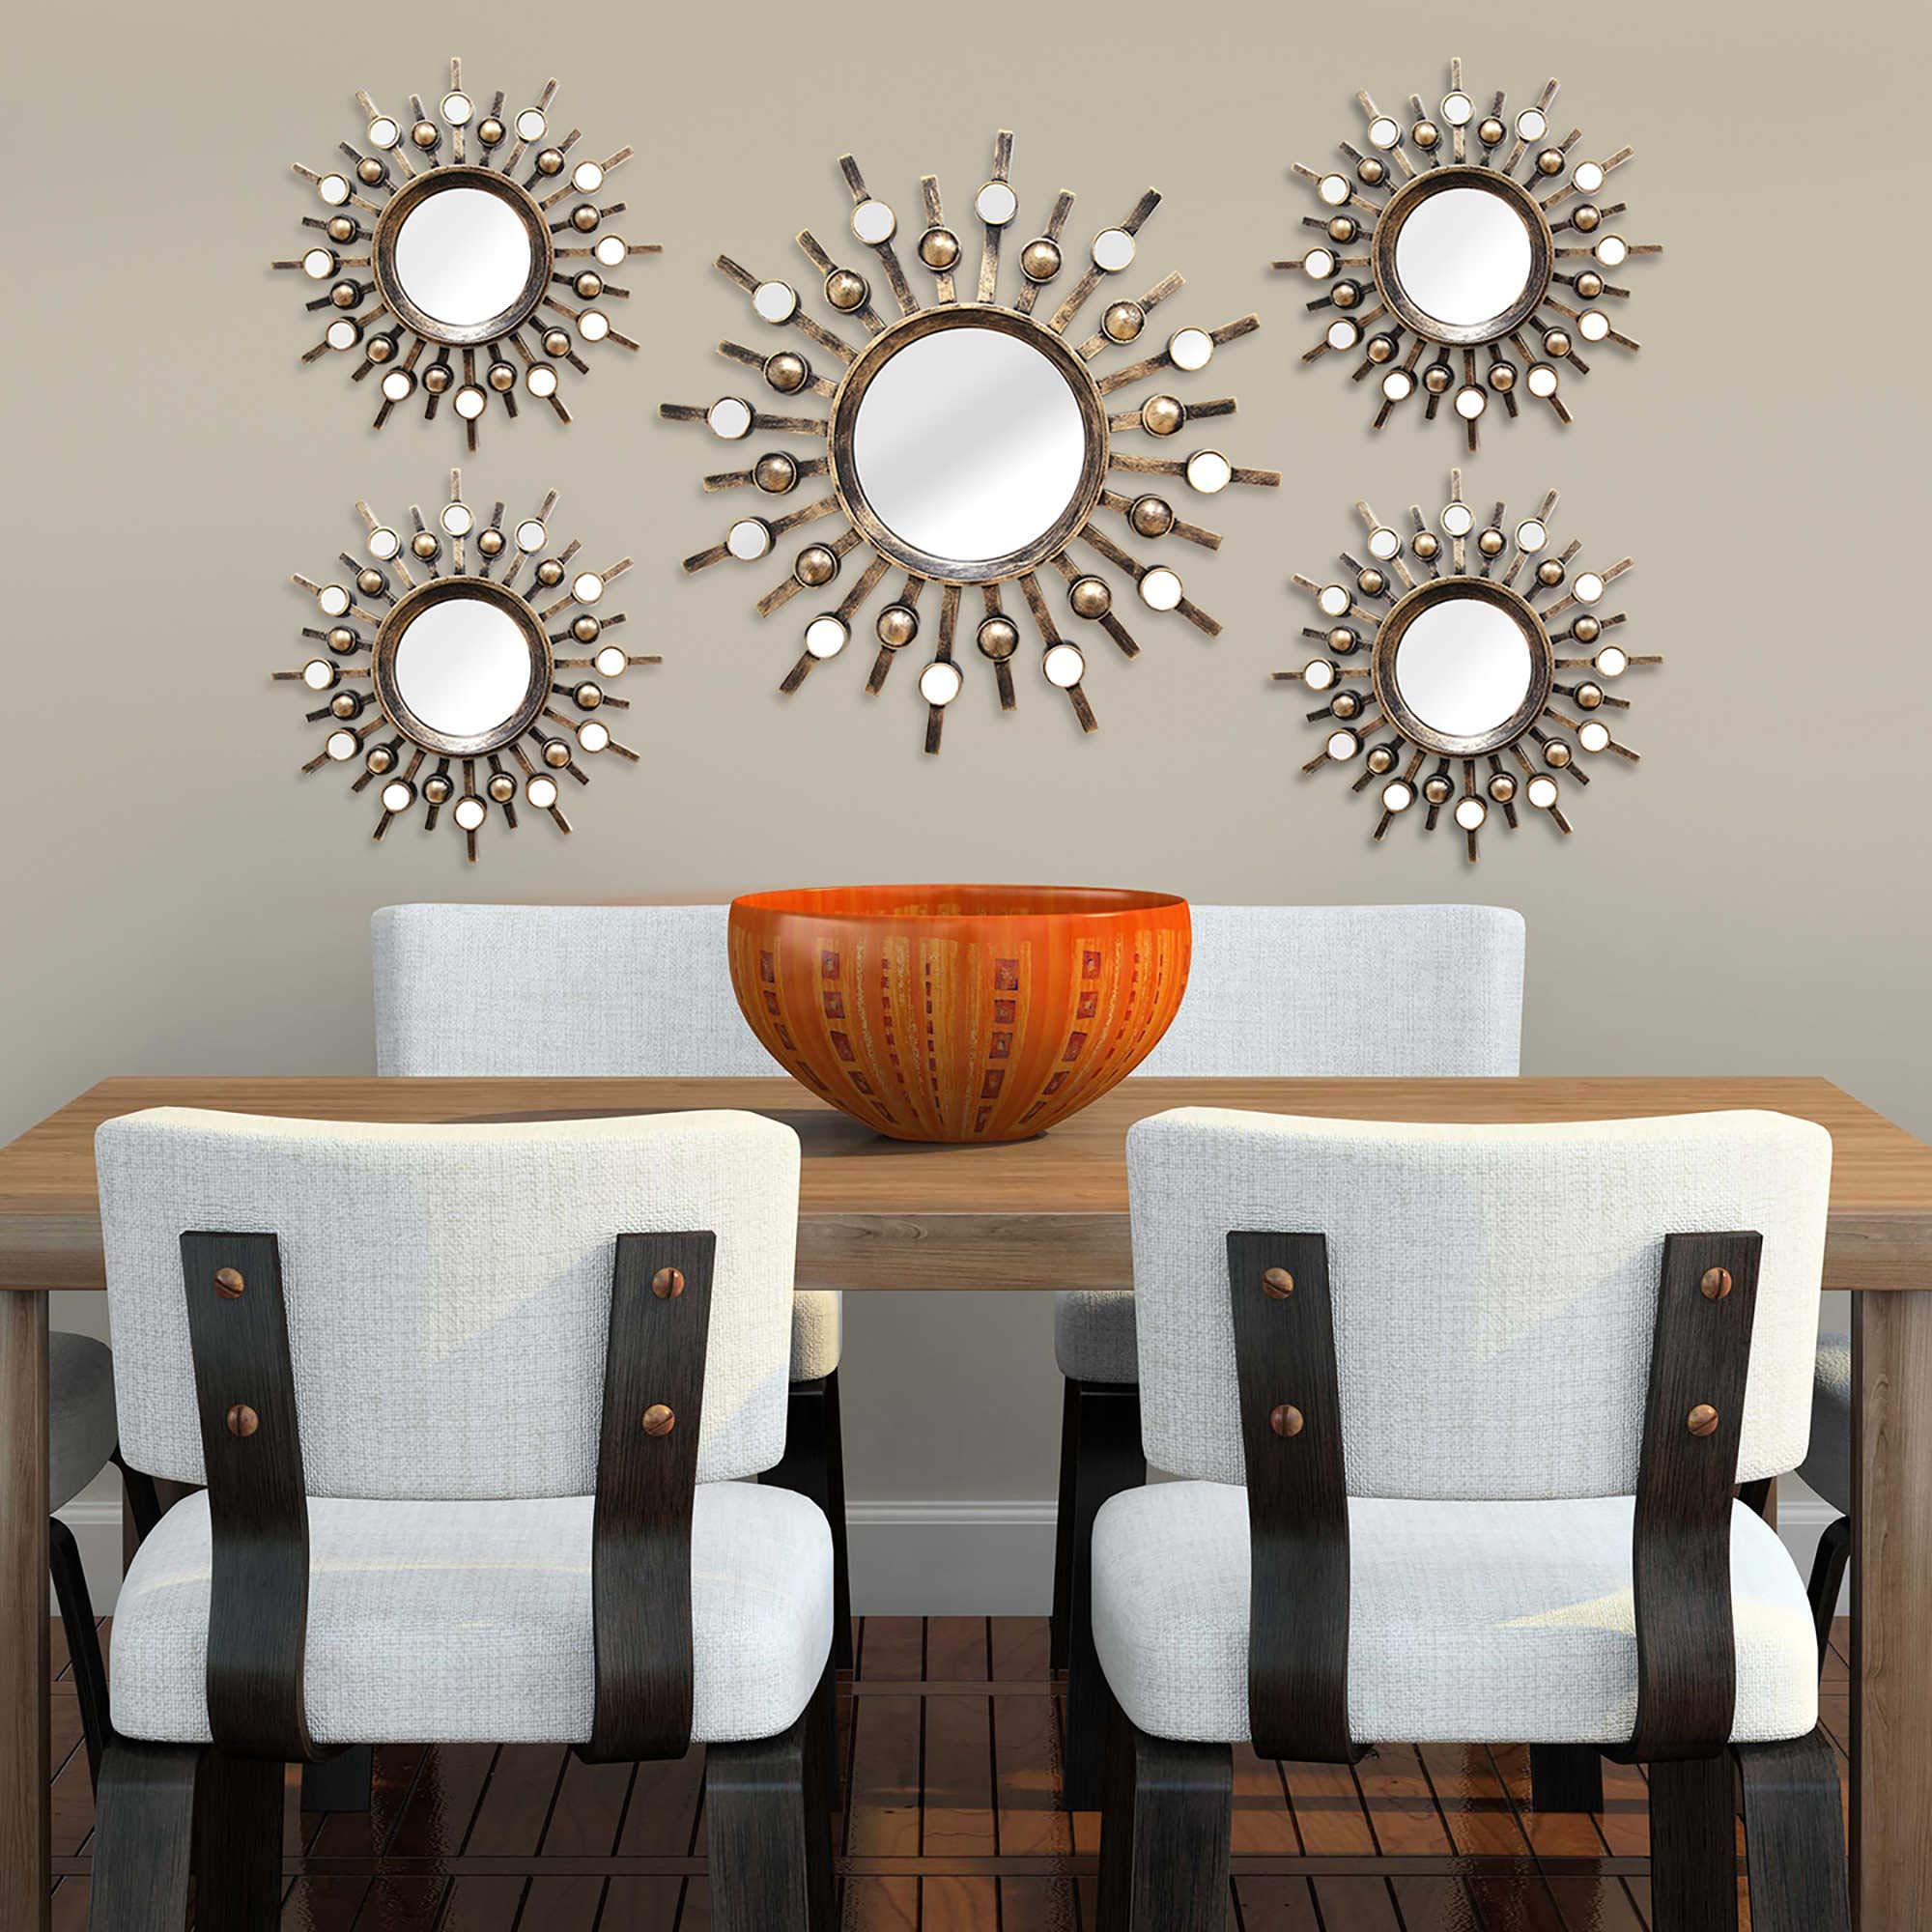 Stratton Home Decor Burst Bronze Wall Mirrors Set of 5, SHD0087